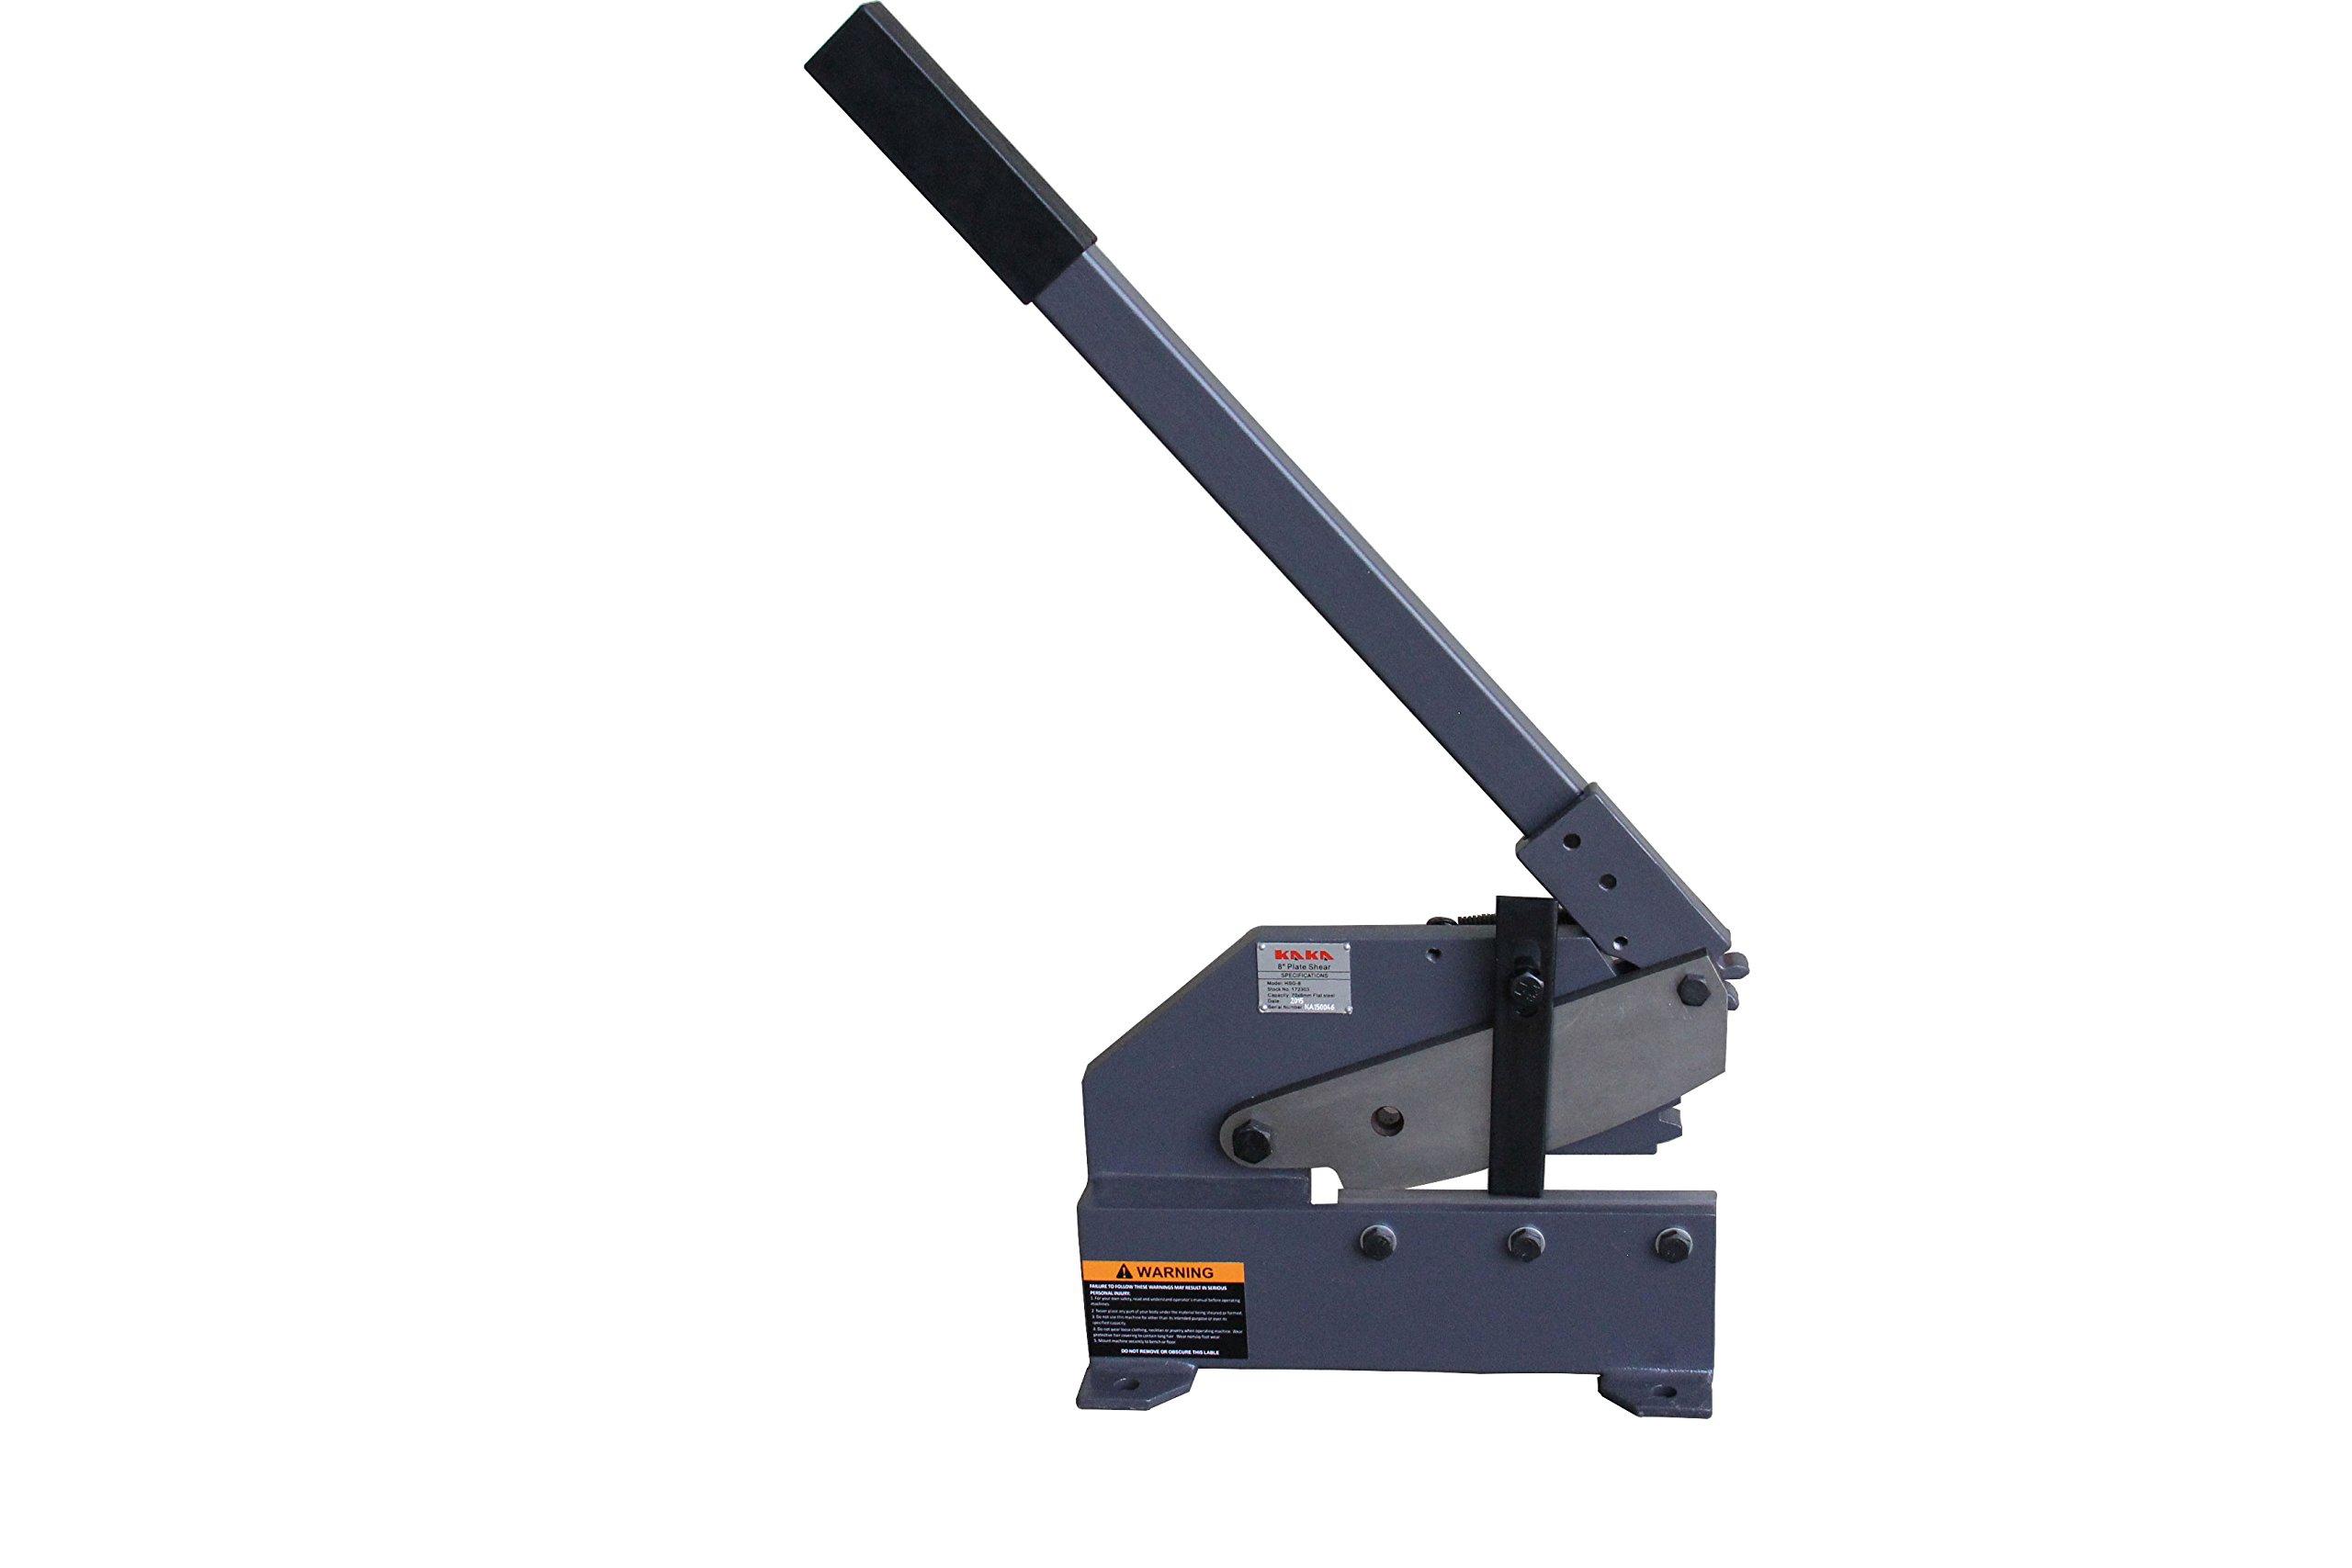 KAKA Industrial HSG-8 8-Inch Heavy-Duty Sheet Metal Plate Shear, Cast-Iron Steel Frame Manual Hand Plate Shear